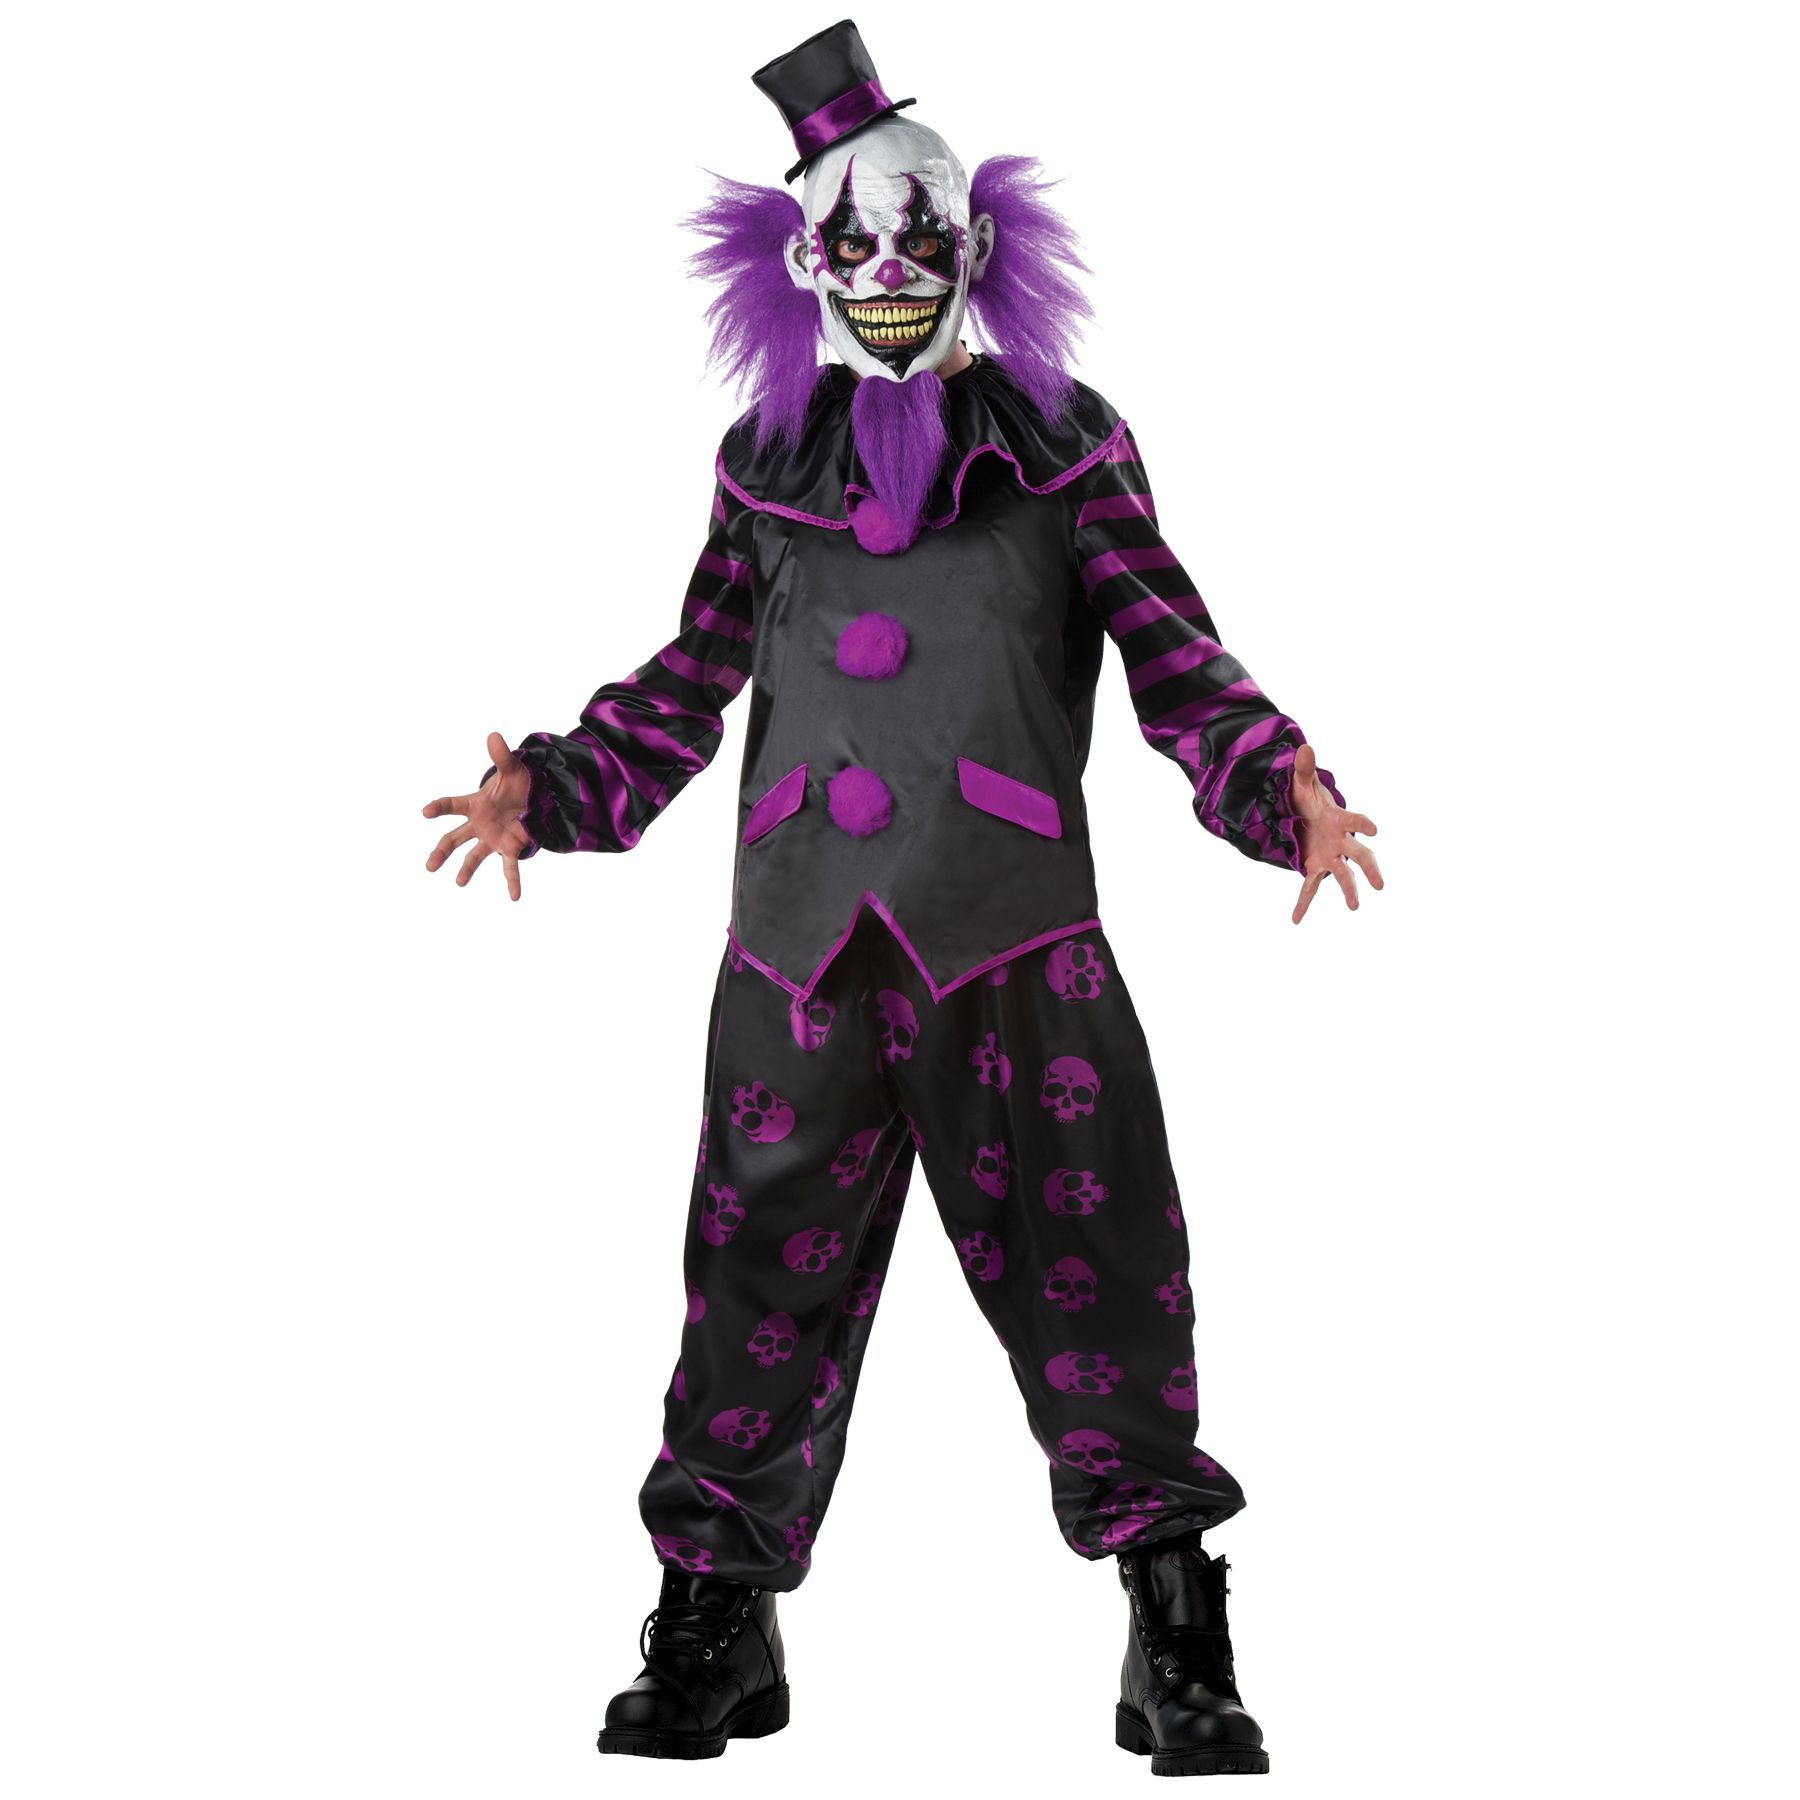 Kmart Halloween Costumes 2020 Ringmaster Men's Bearded Clown Costume, Size: XL | Clown costume, Scary clown